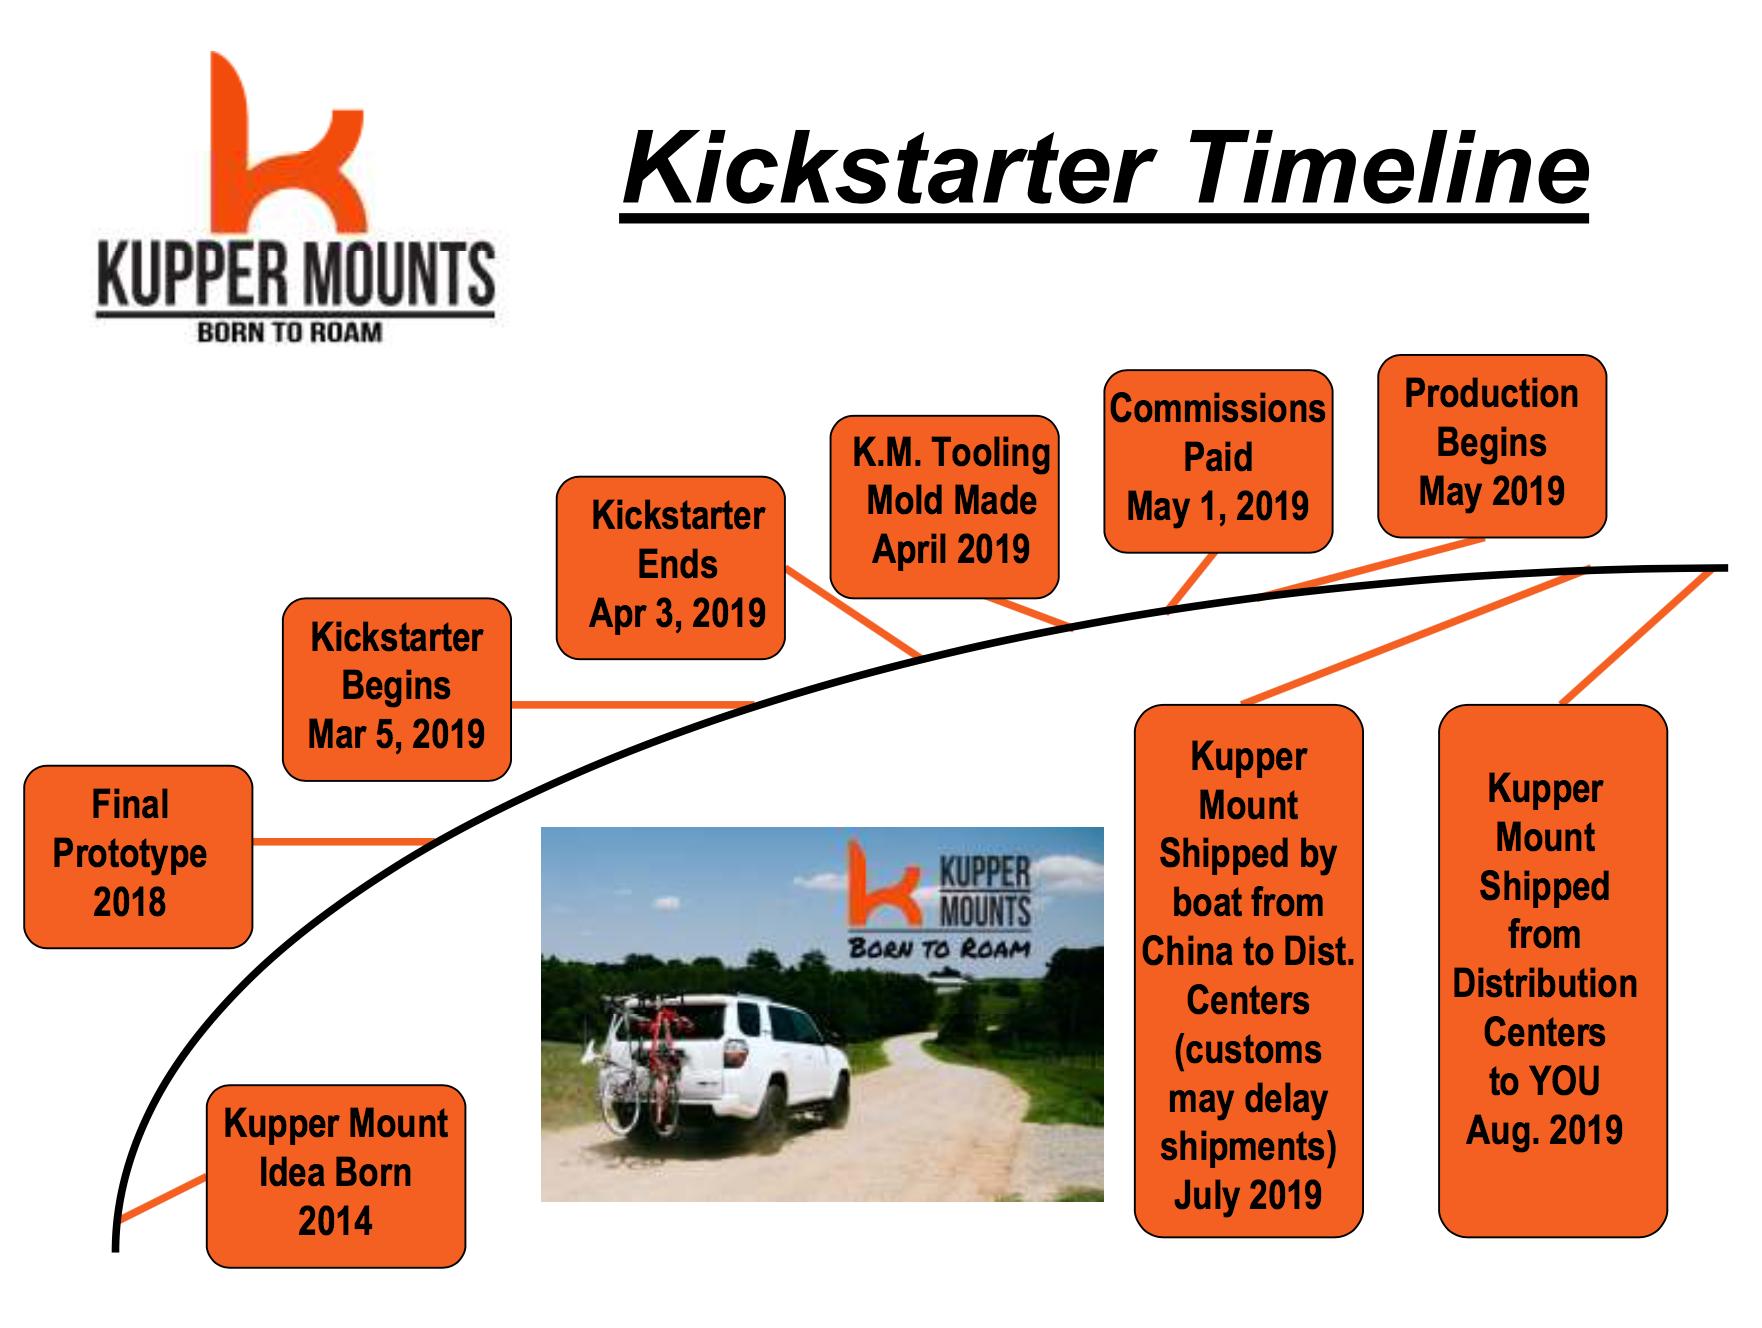 Kupper Mounts Time Line for Kickstarter Crowdfunding Campaign.png